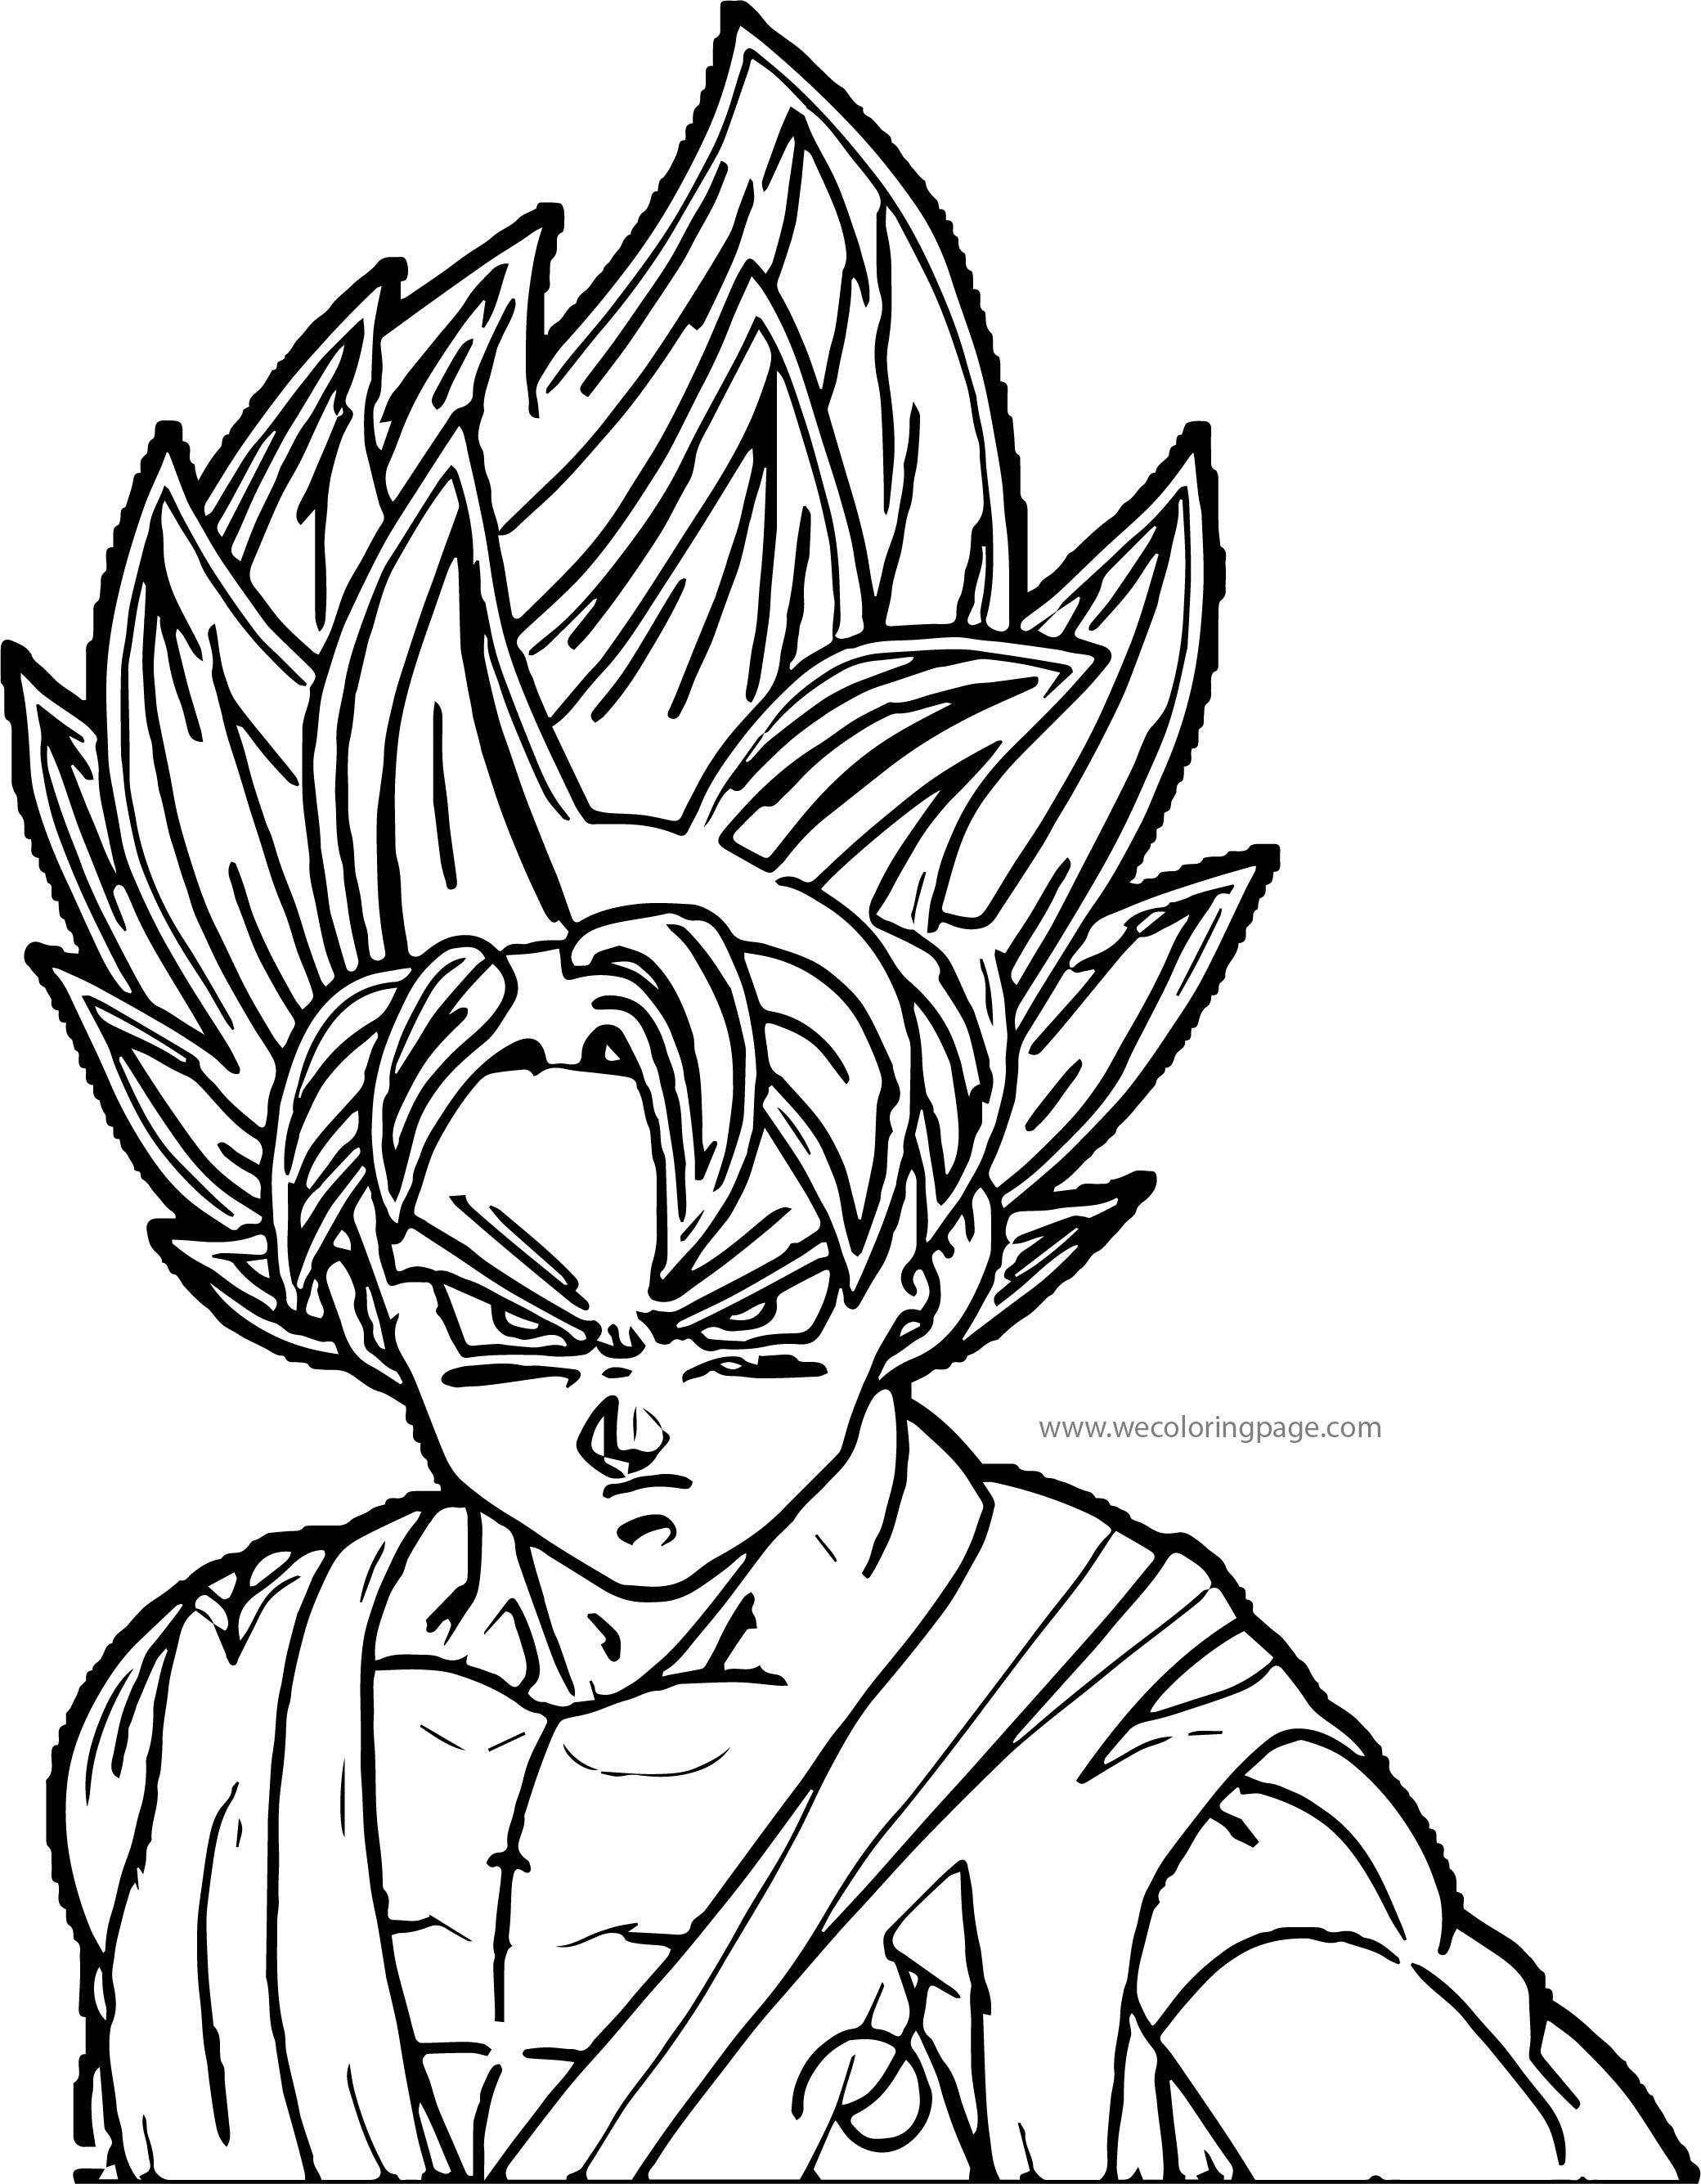 Goku We Coloring Page 043